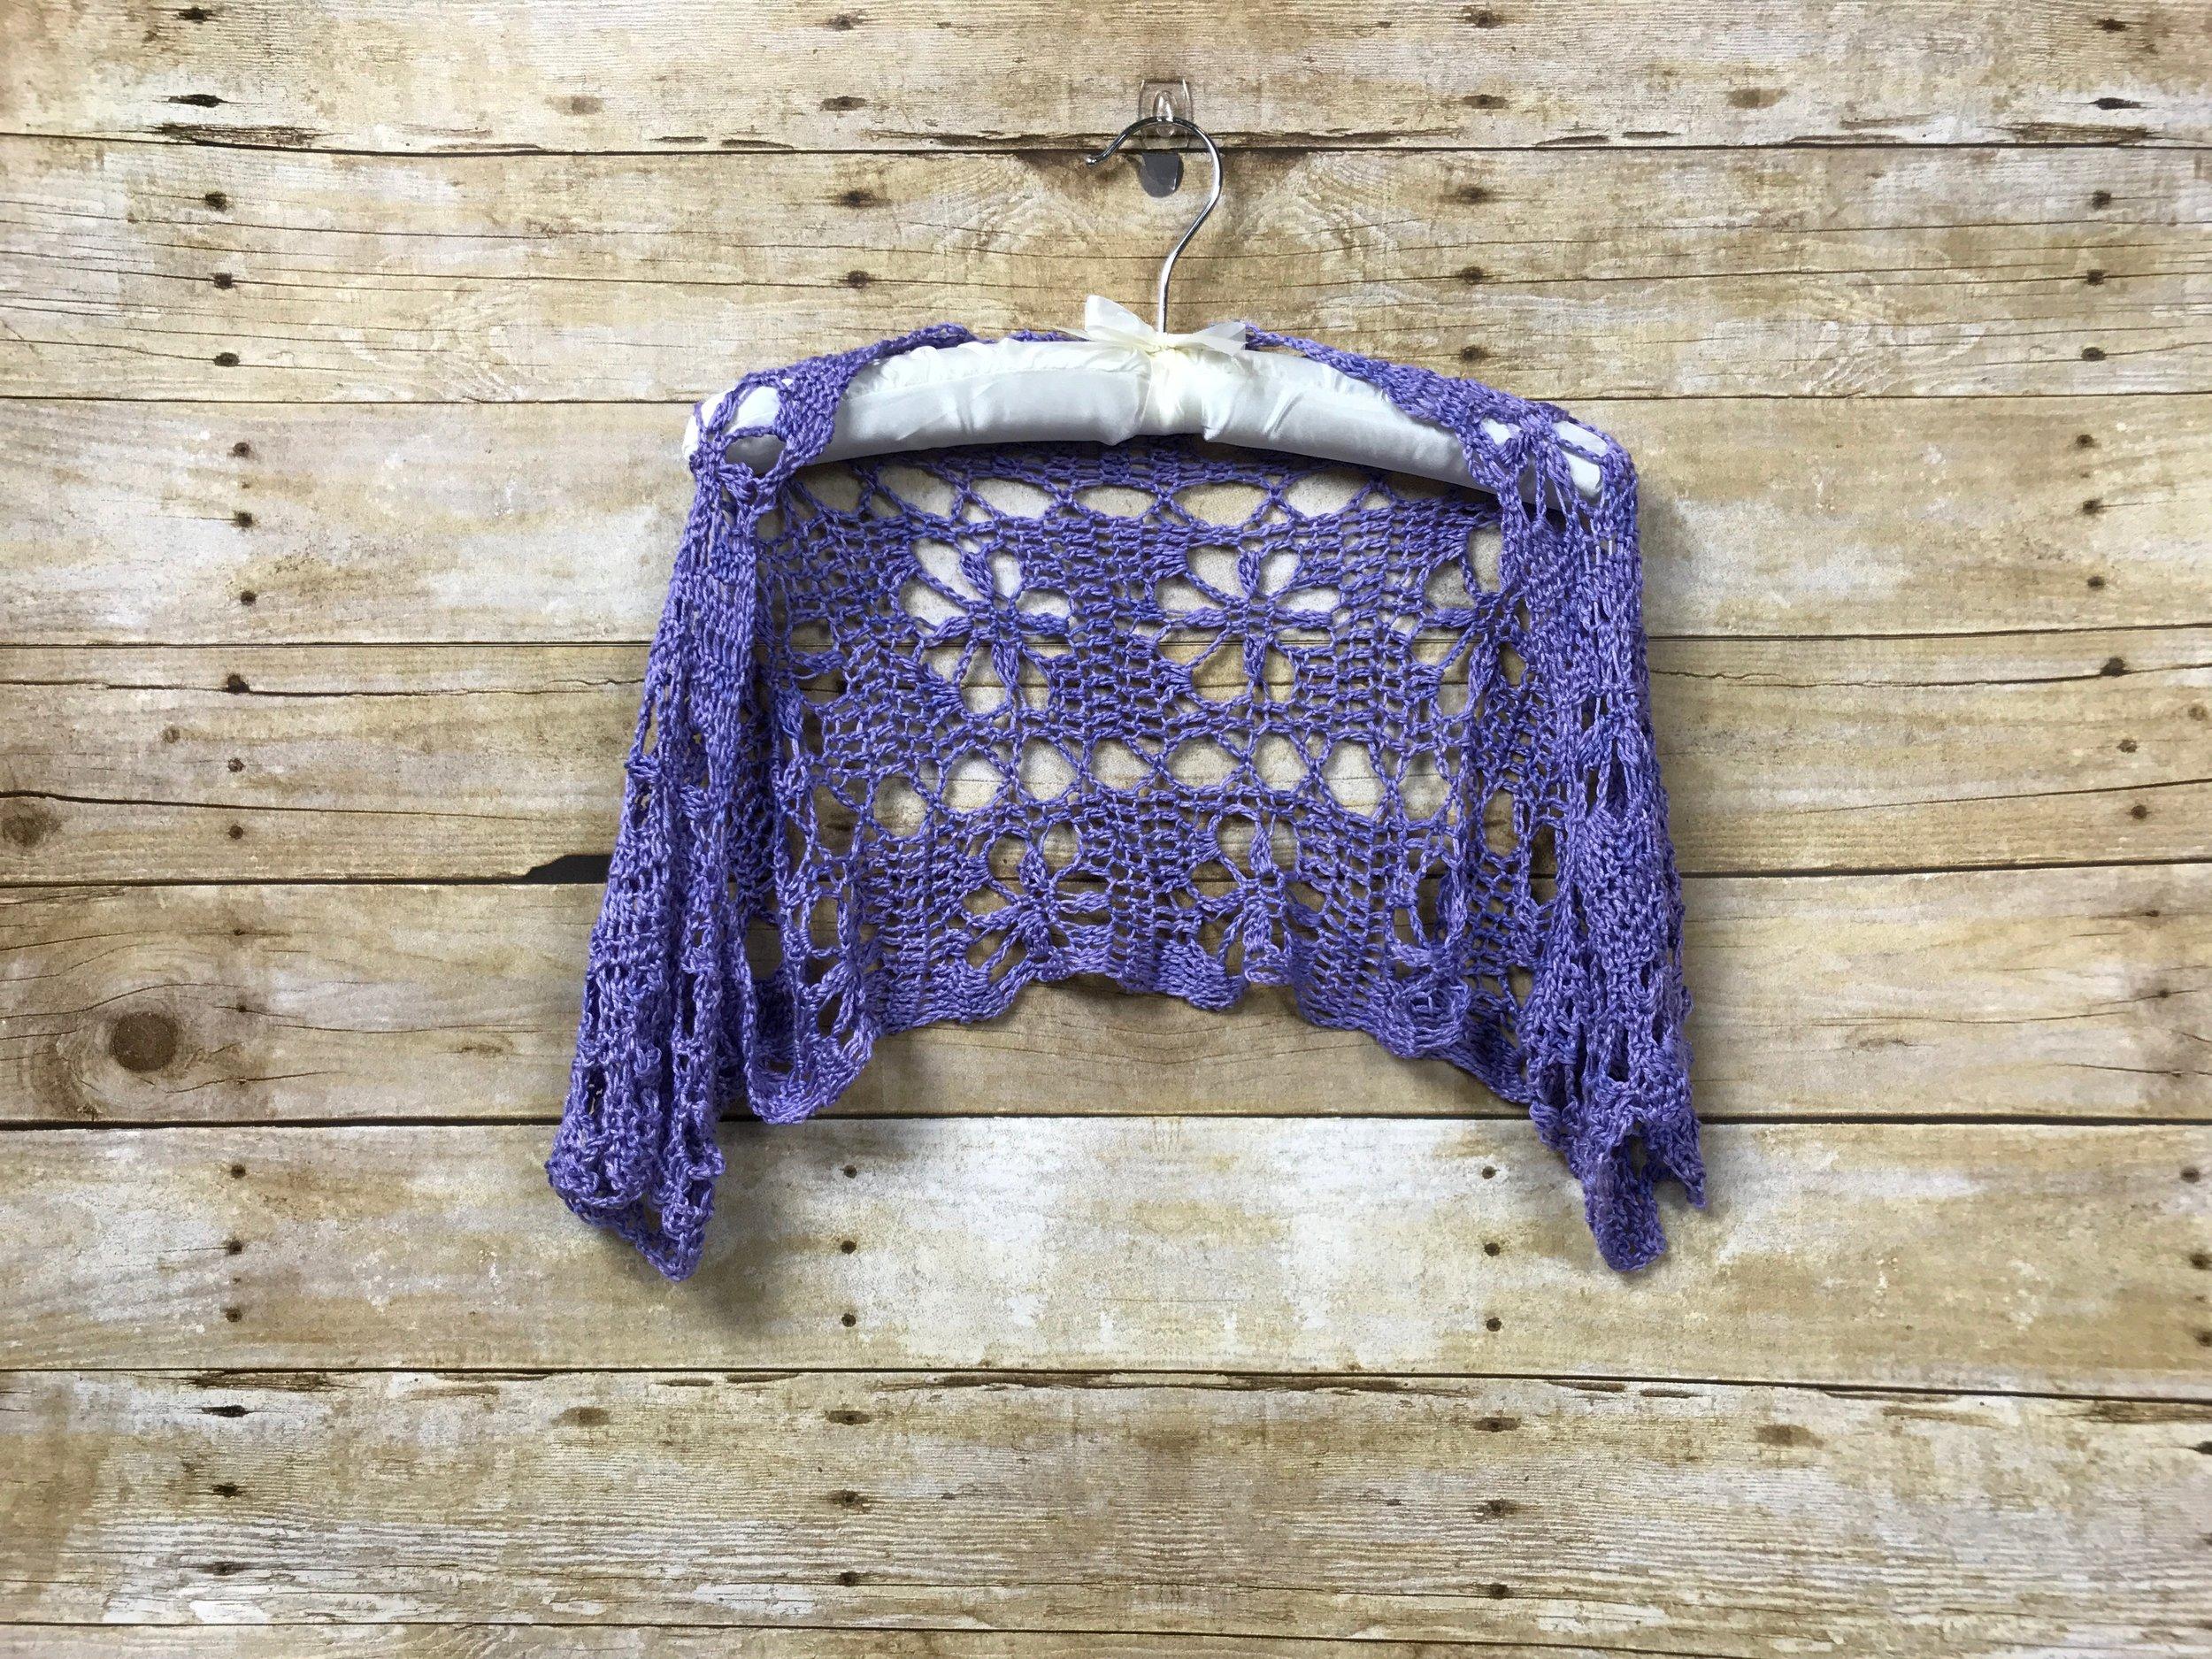 Sporty skye knit lace shrug free pattern kristin omdahl may 27 sporty luna crochet shrug free pattern bankloansurffo Gallery